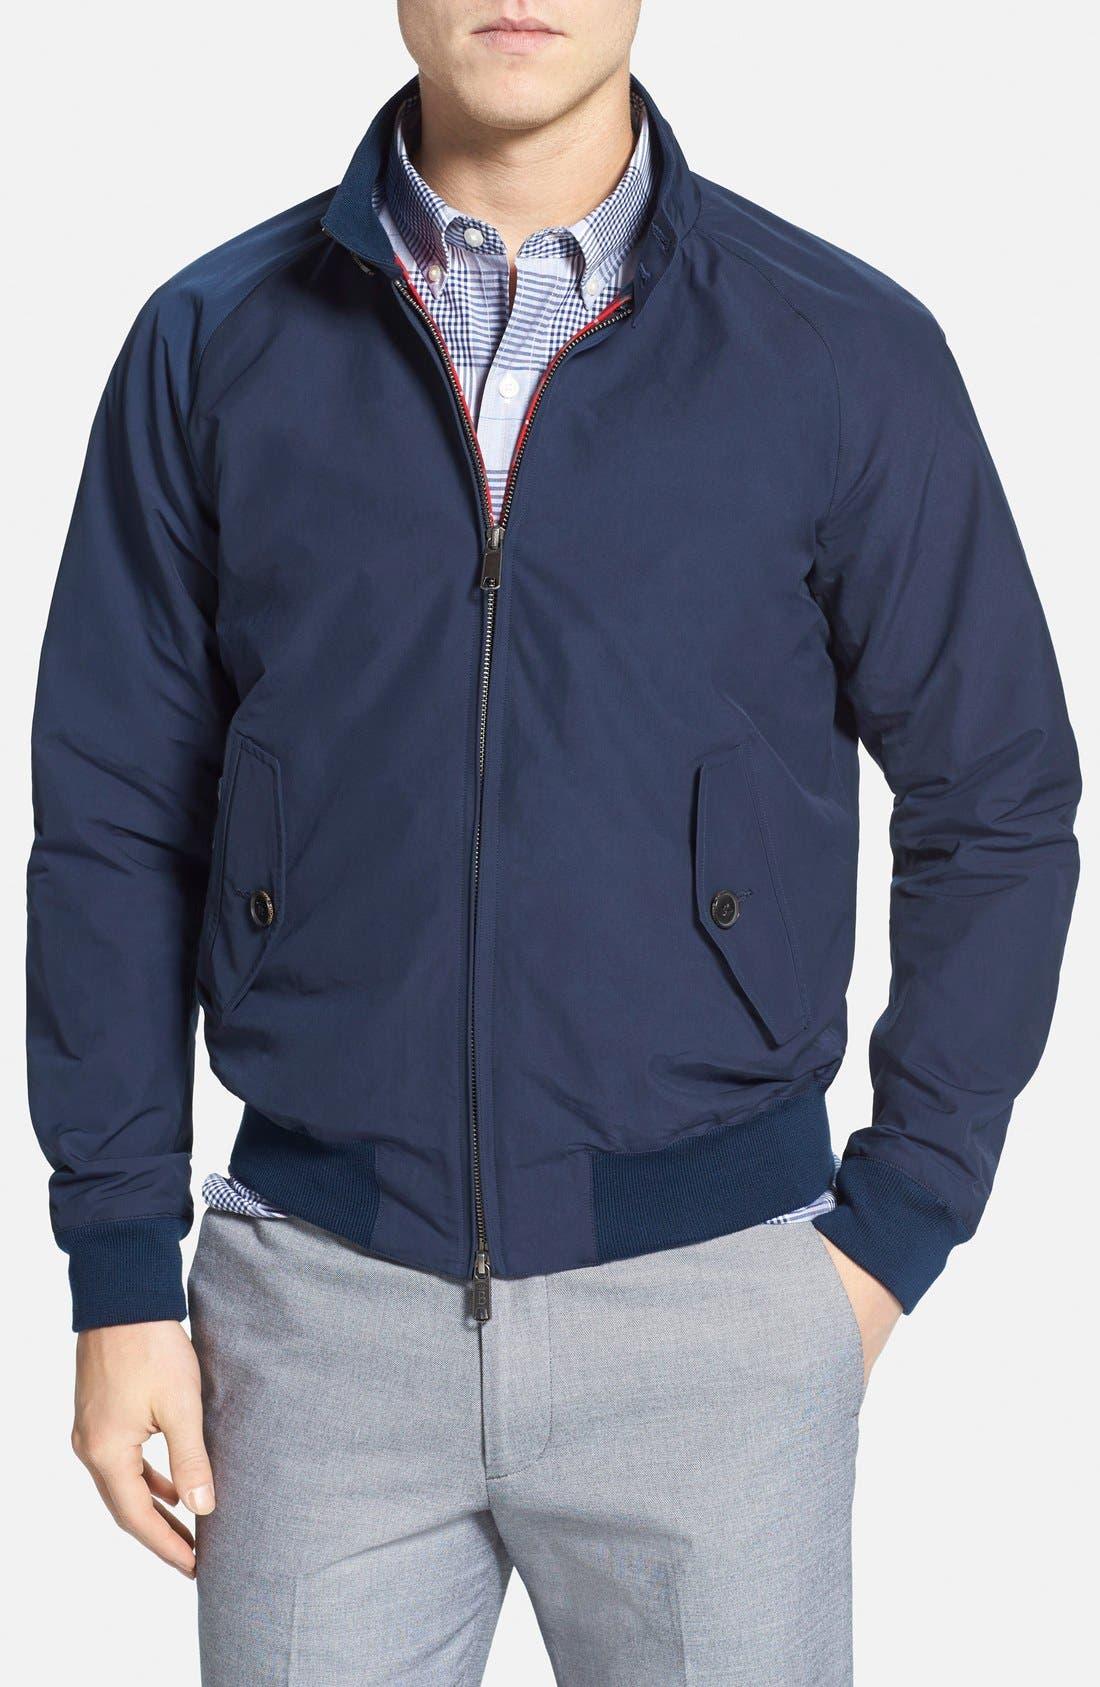 Main Image - Baracuta G9 Water Repellent Harrington Jacket